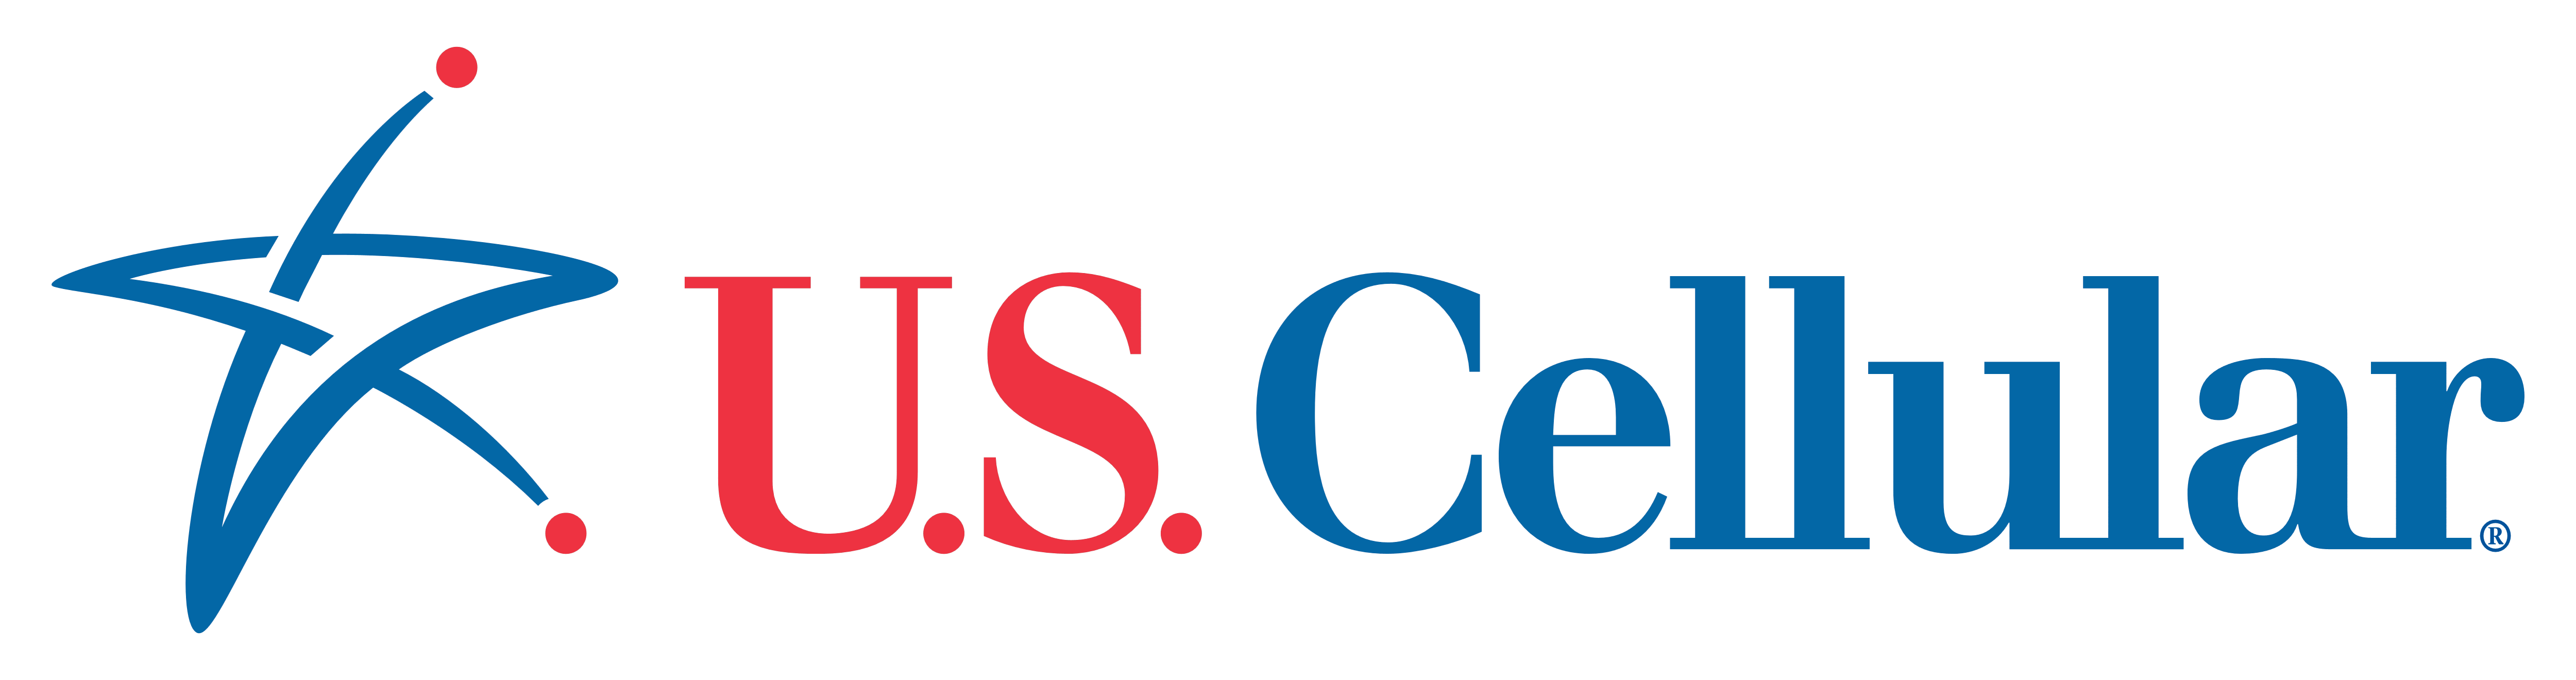 US Cellular's logo